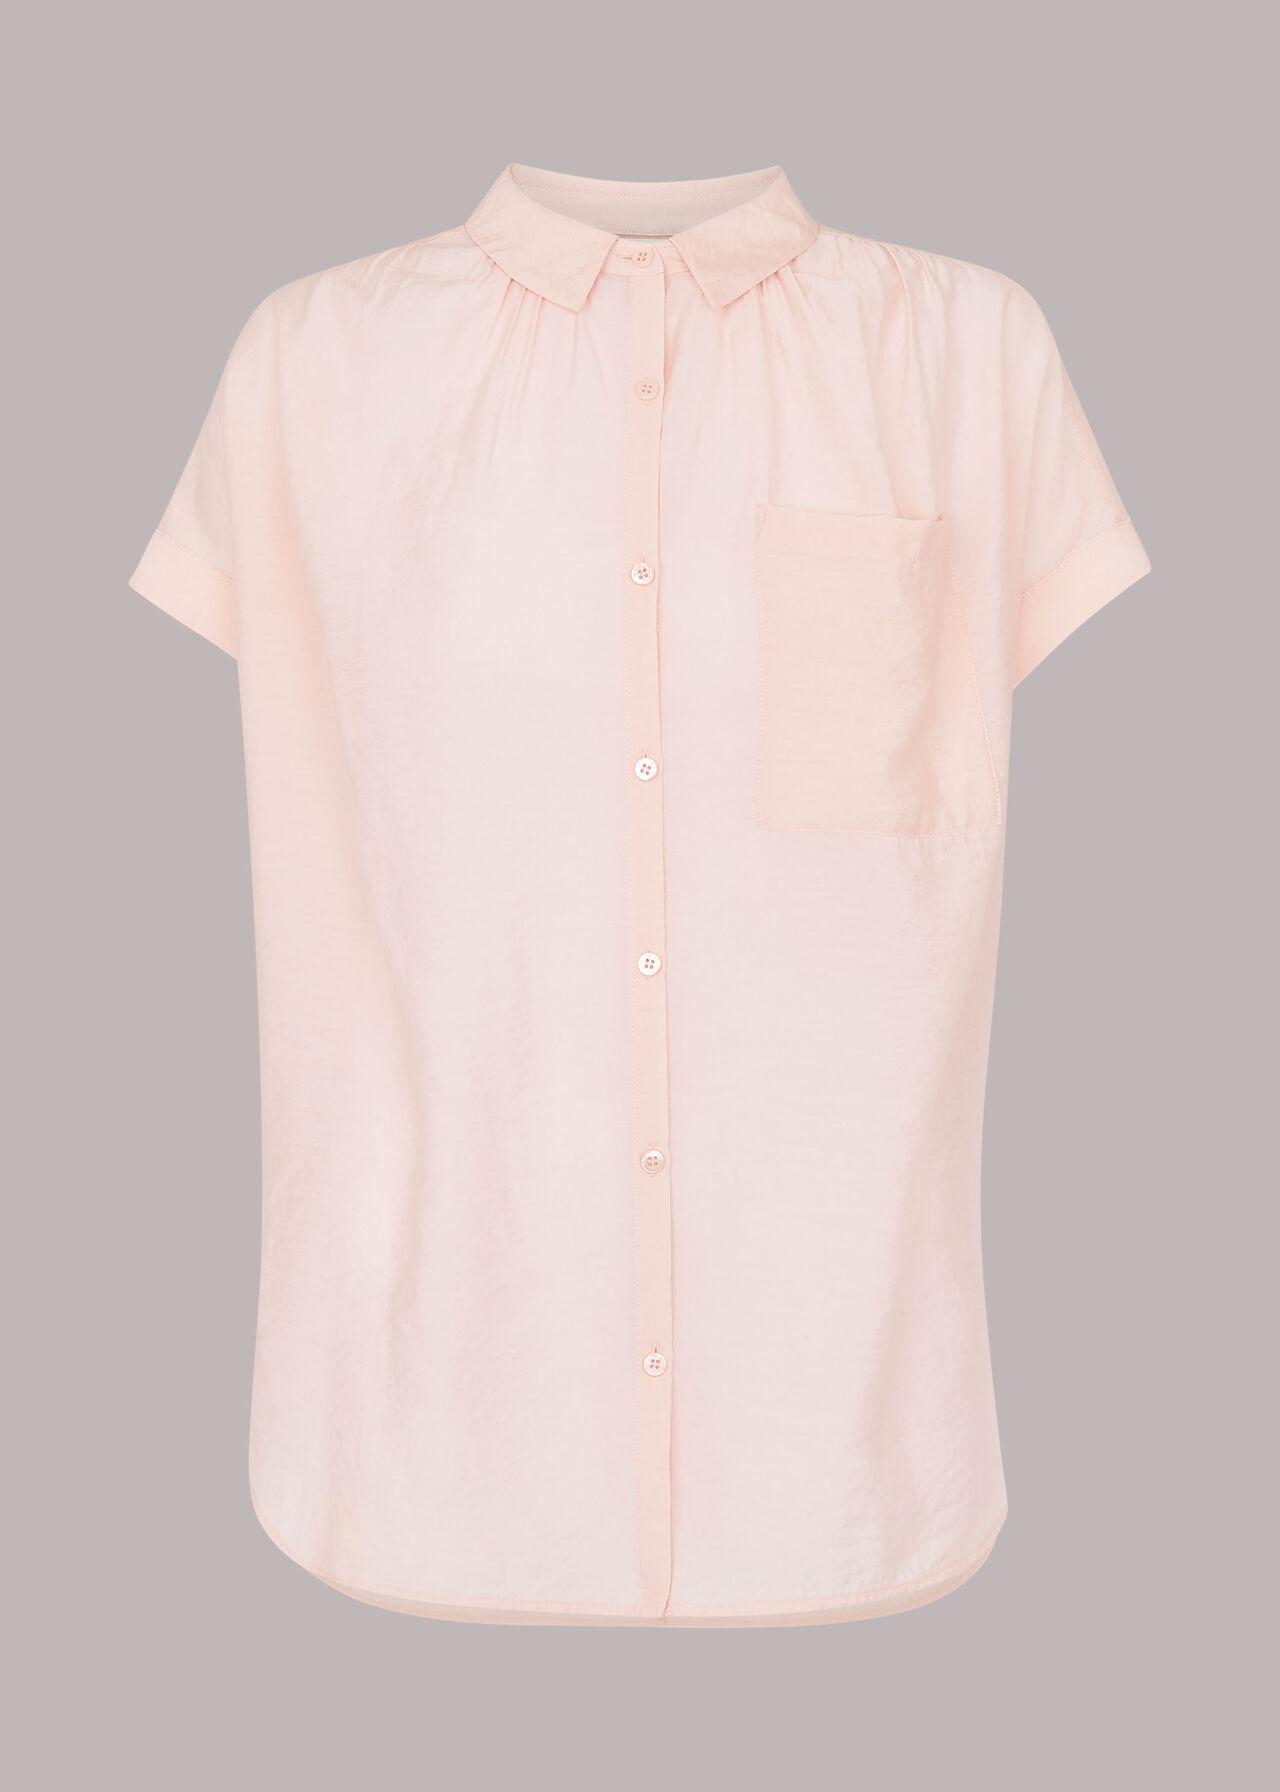 Nicola Button Through Shirt Pale Pink